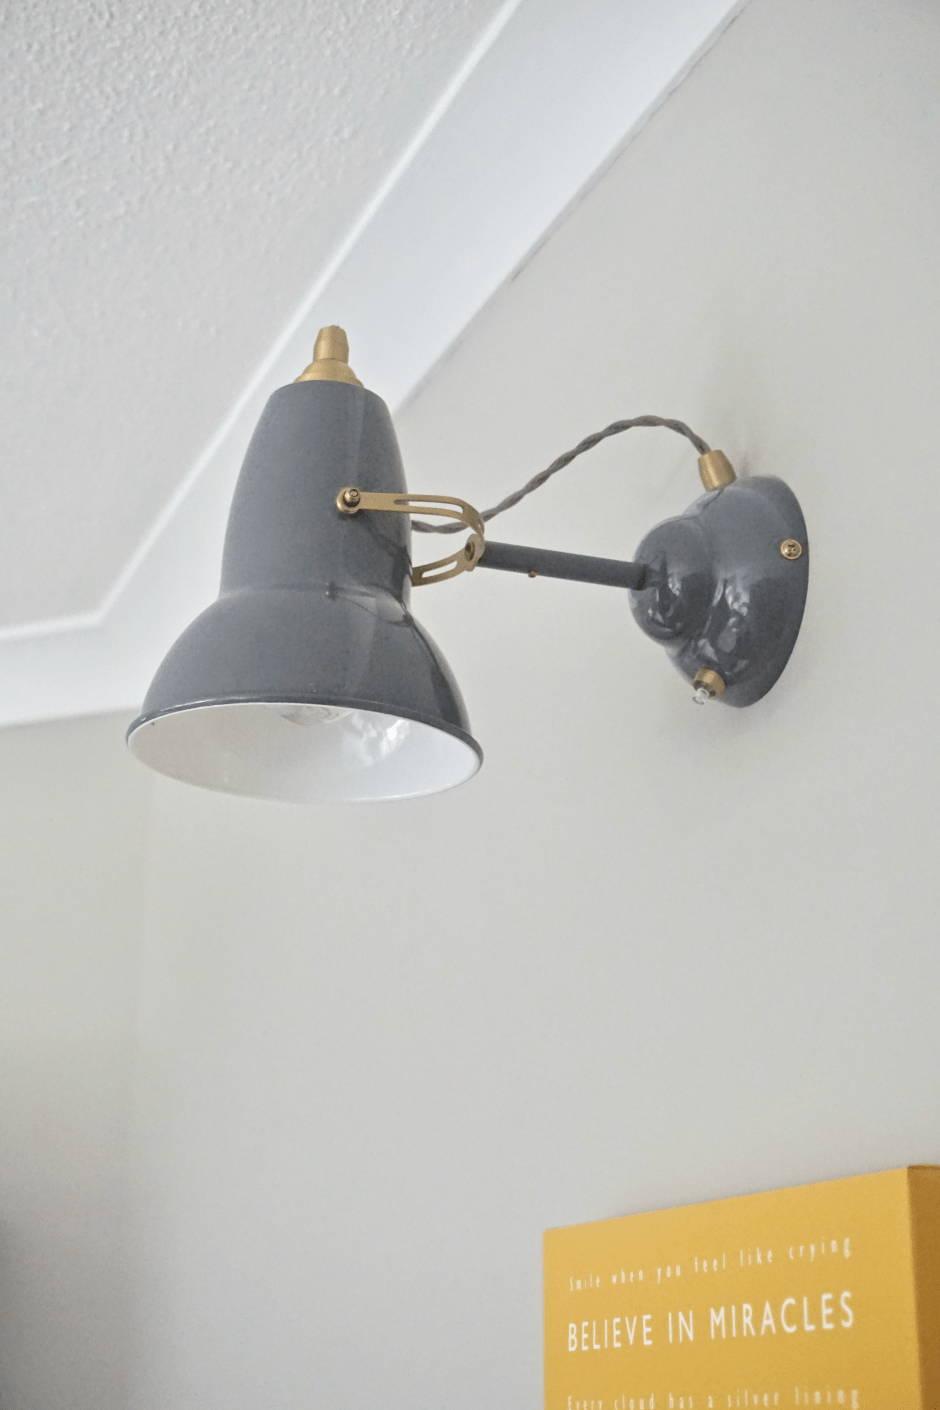 Anglepoise Original 1227 Brass Wall Light available from Inspyer Lighting